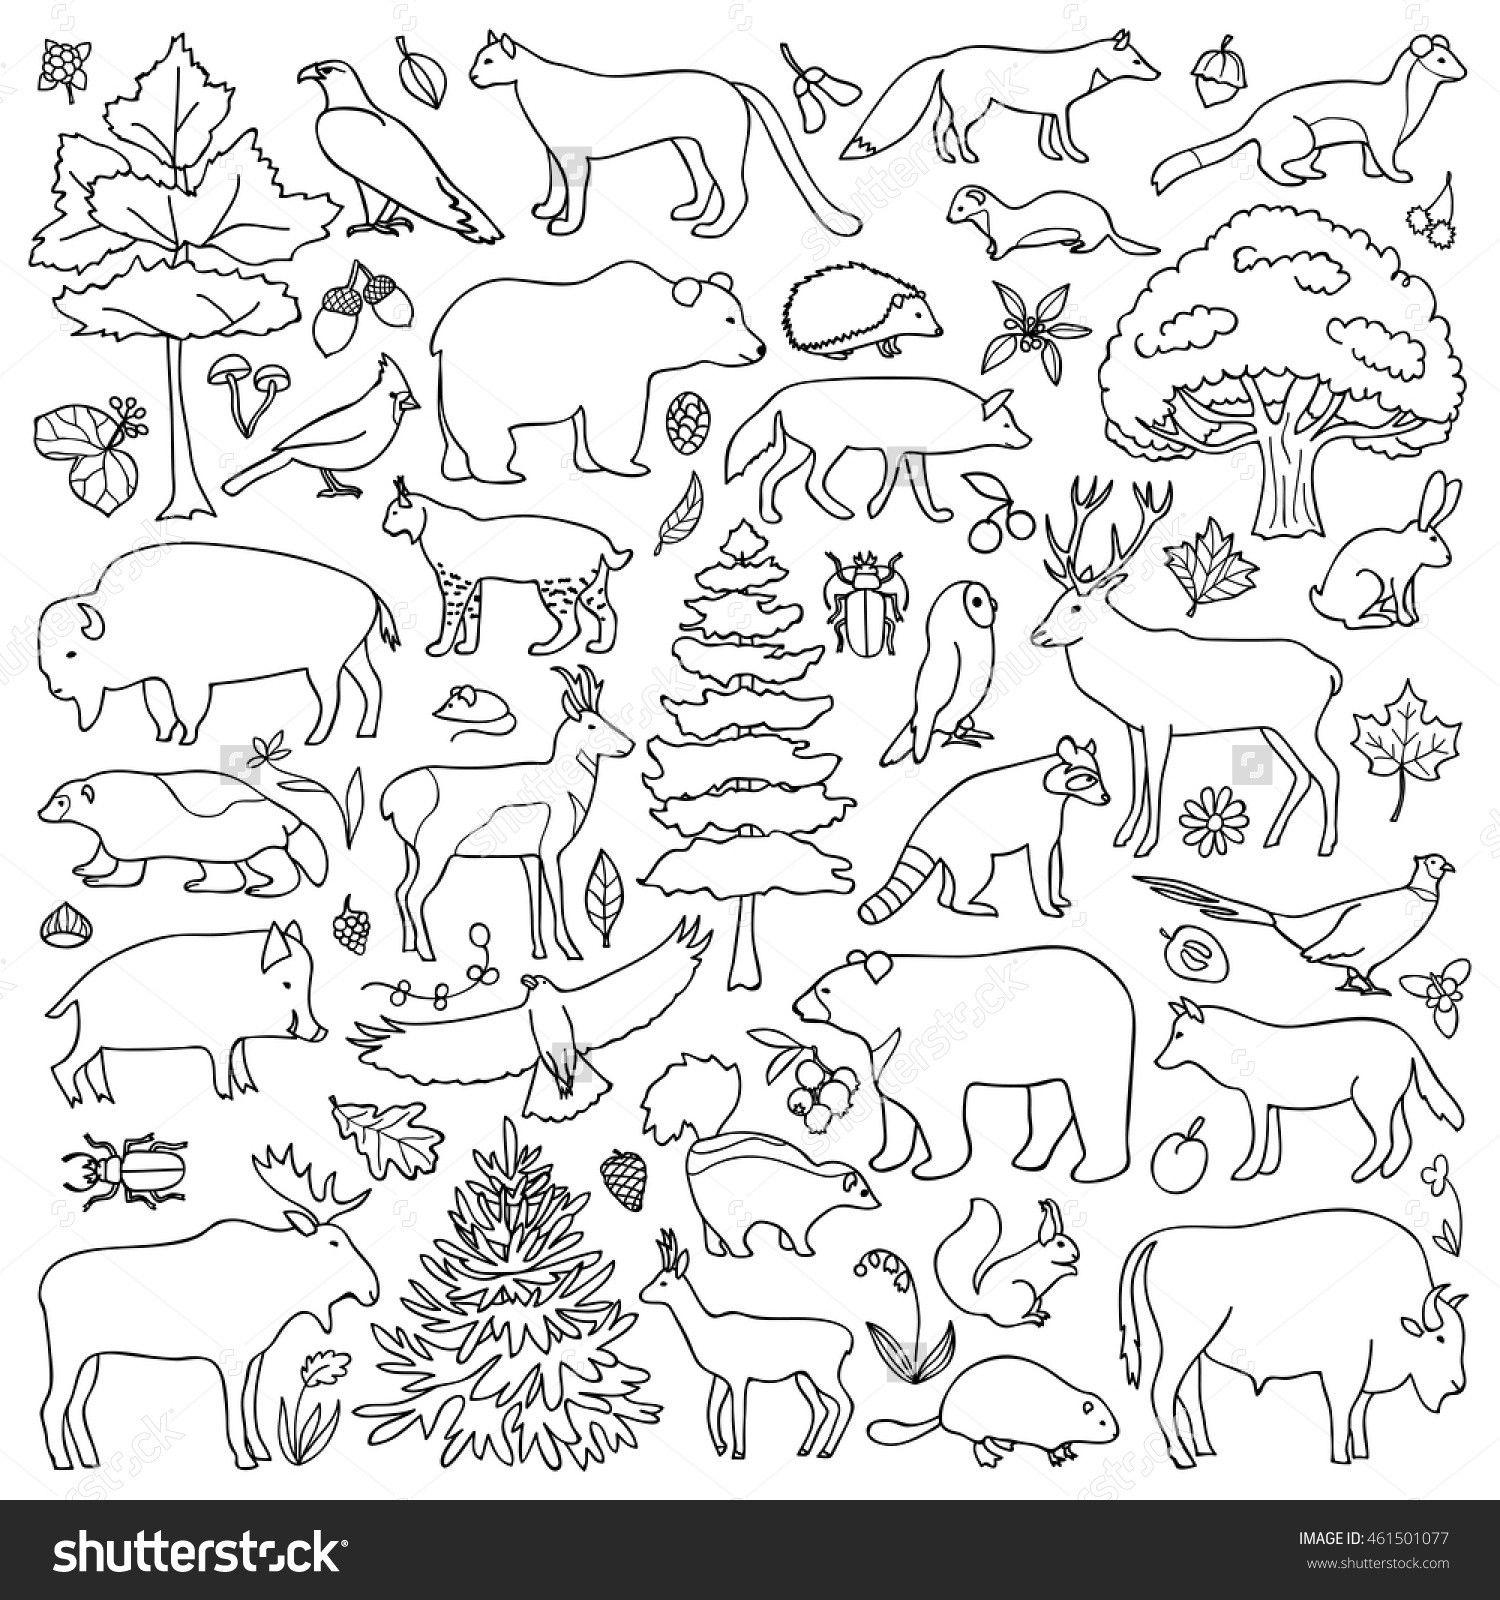 7 Forest Animals Preschool Worksheets F0cbe